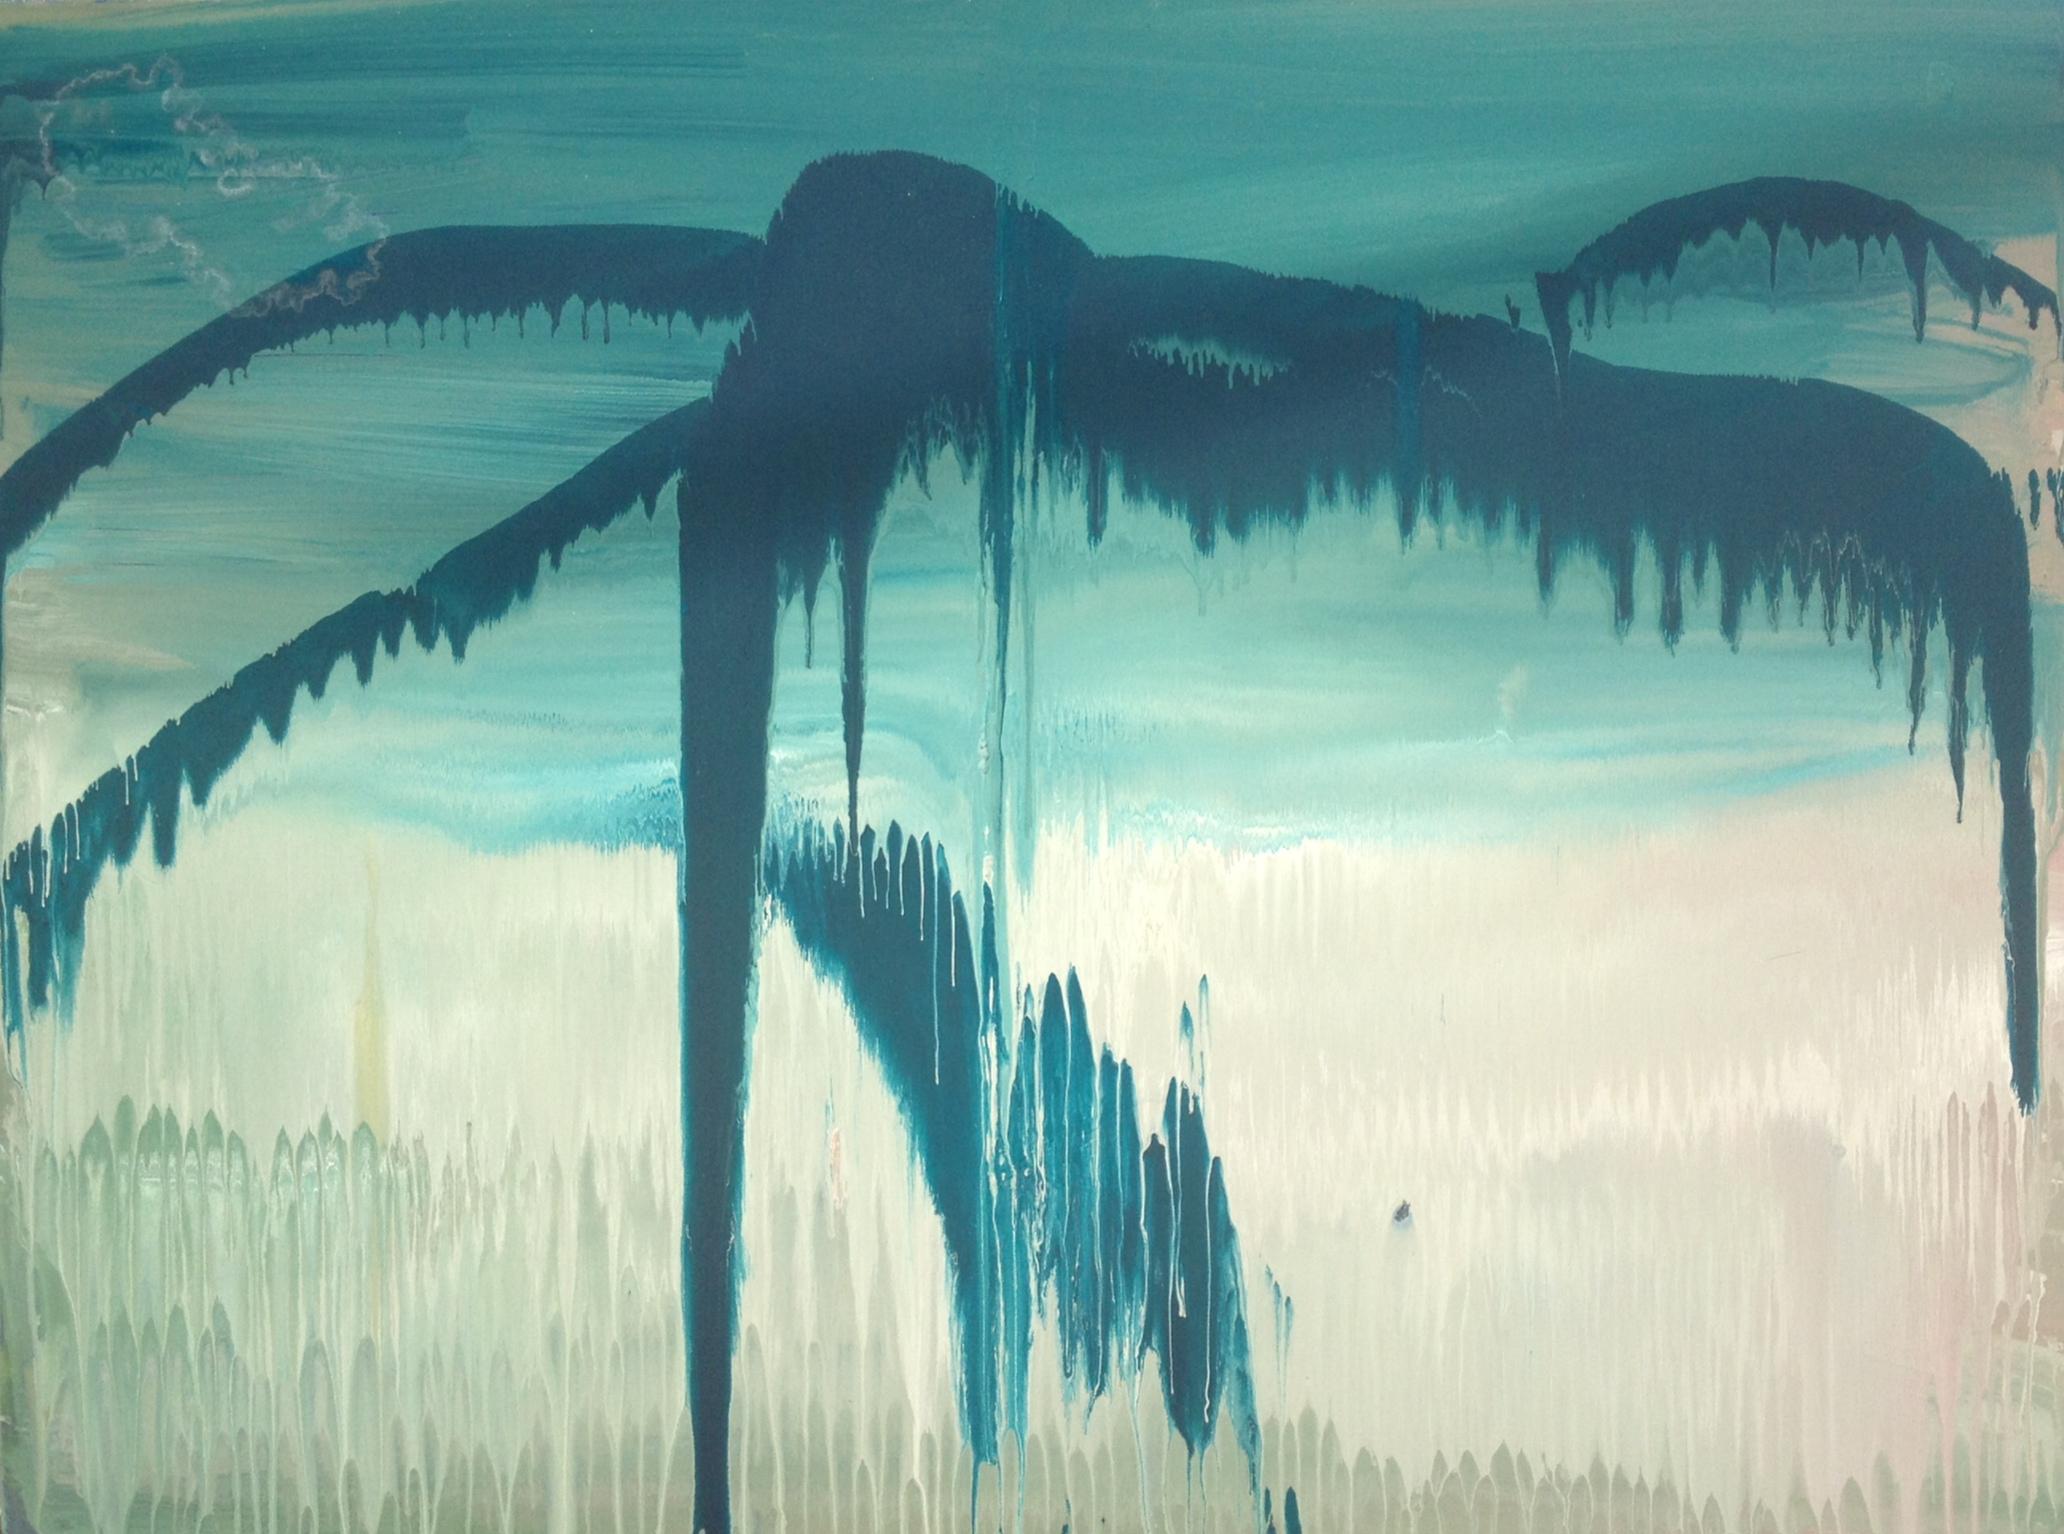 Apocalypse, 2011 2.5ft x 3.5ft, watercolour on canvas